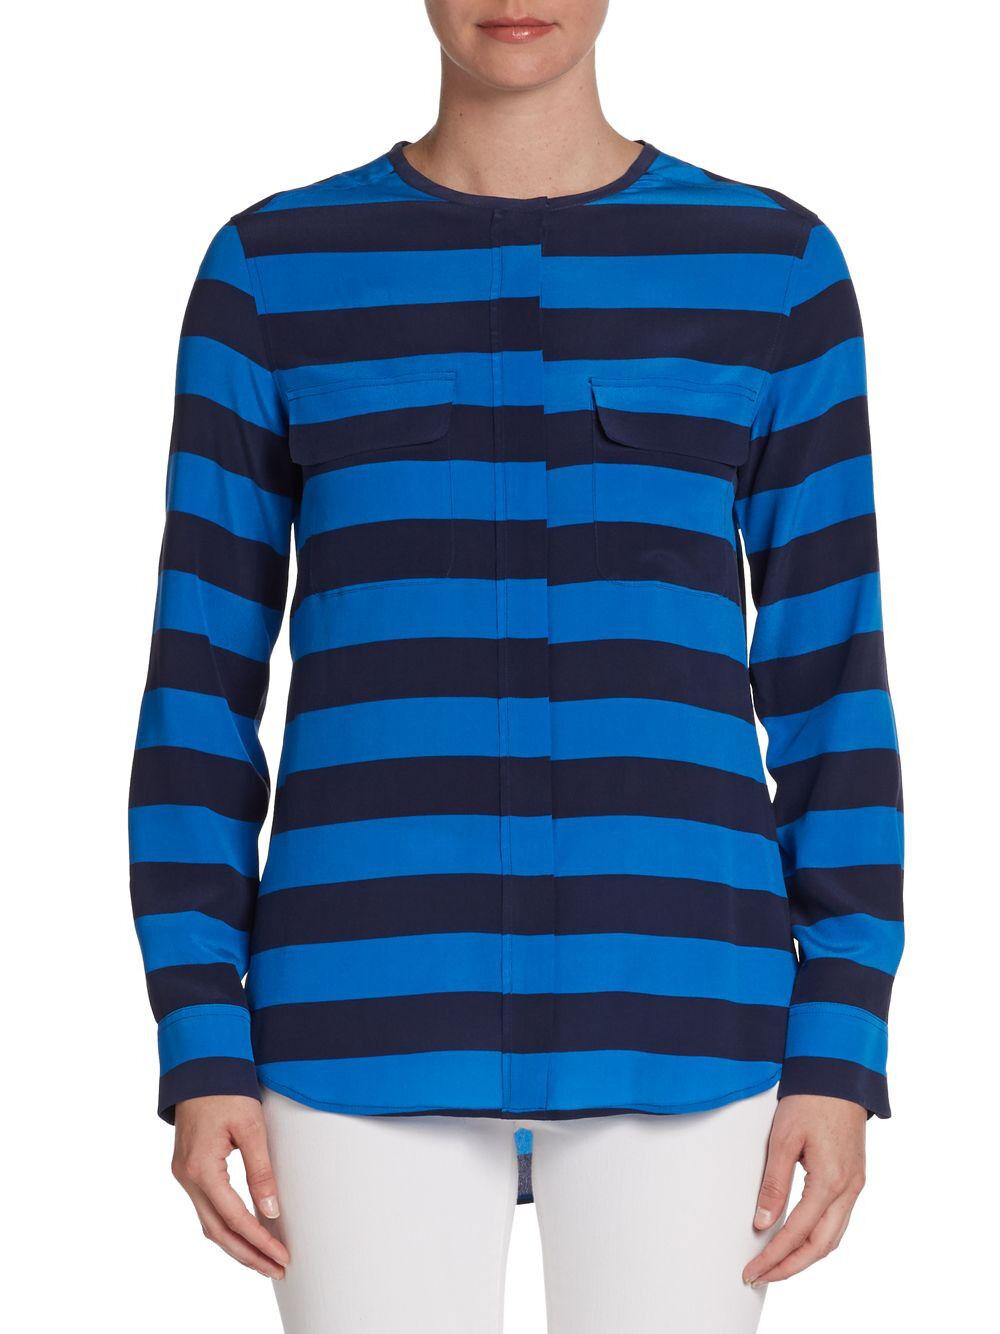 Equipment Navy Blau Lynn Striped Silk Shirt Blouse Top Größe L 12 14 NEW